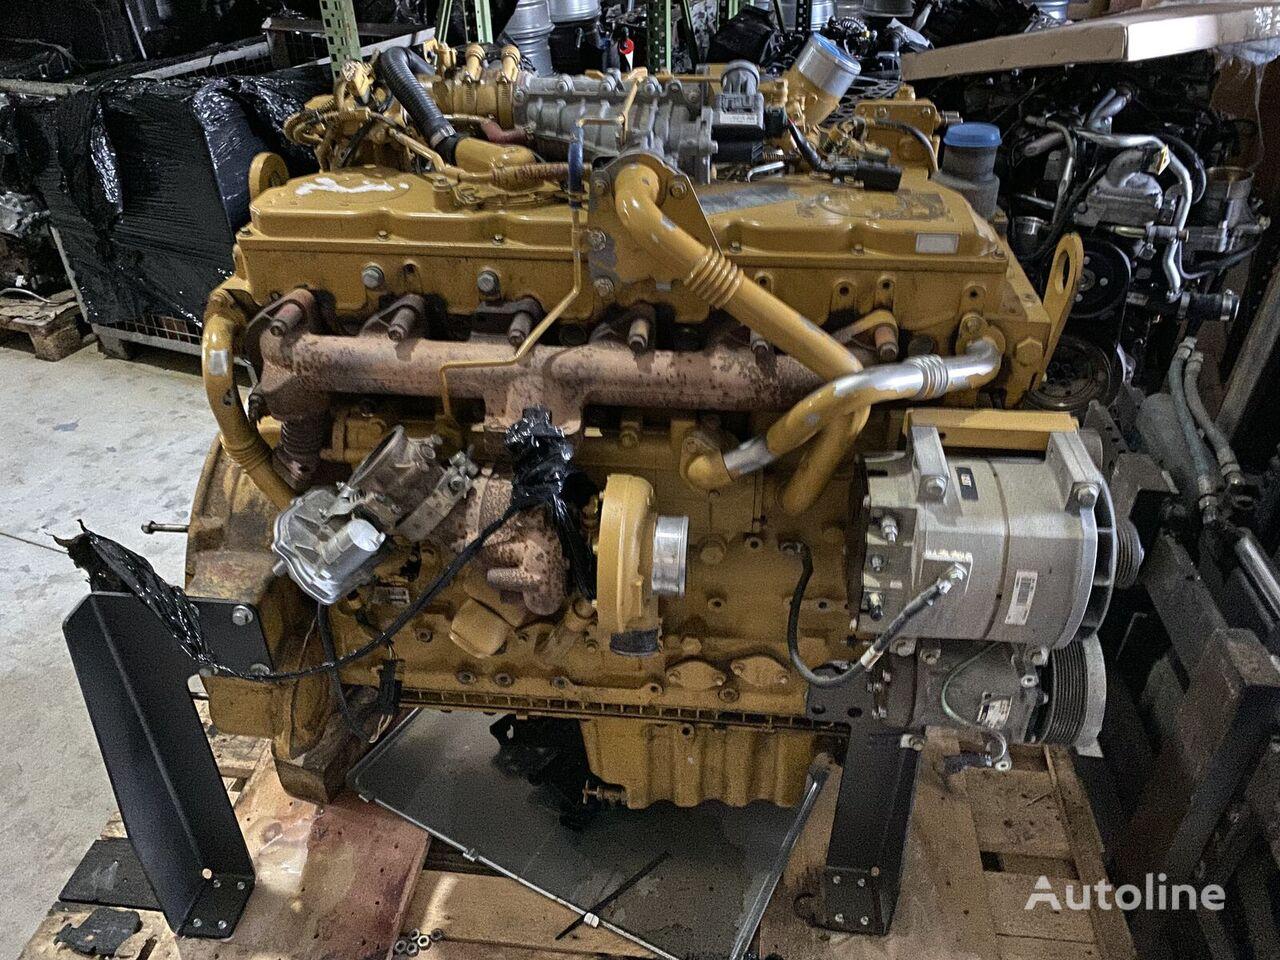 CATERPILLAR engine for wheel loader